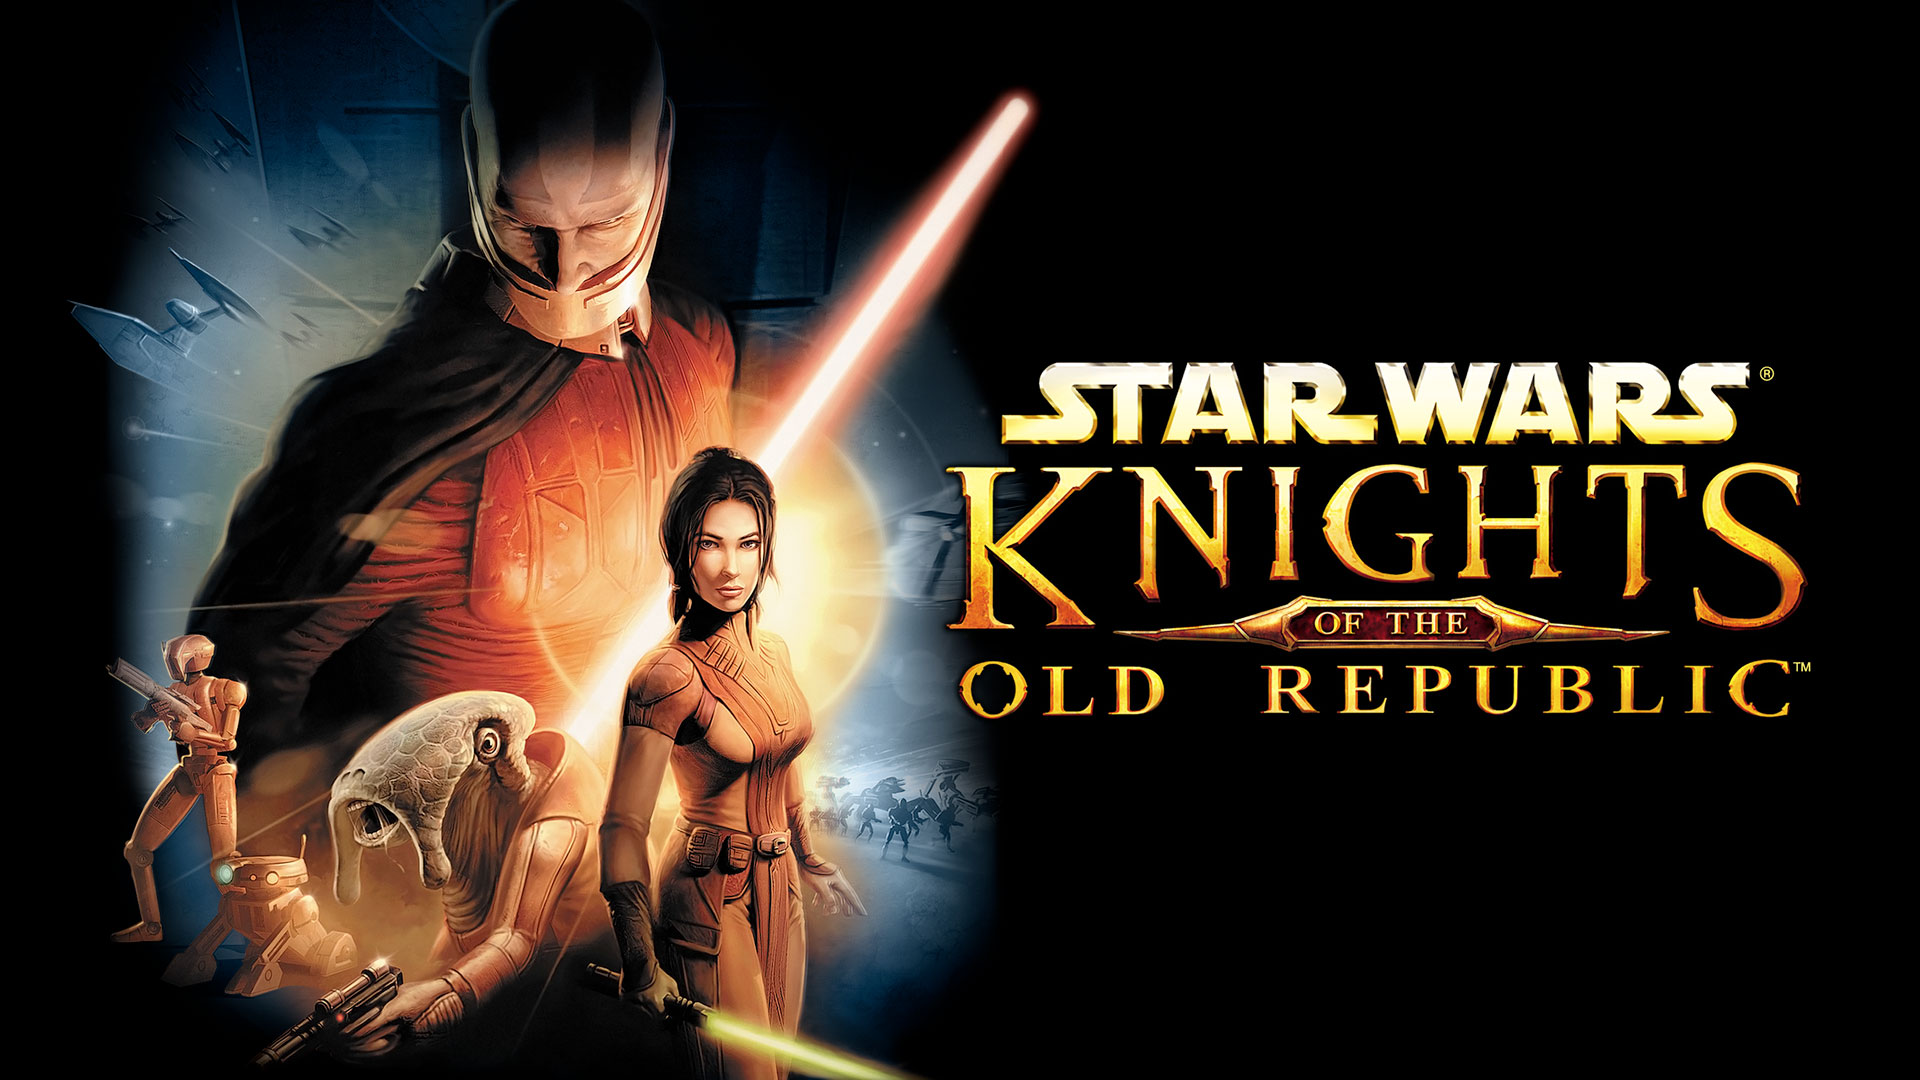 Nintendo Direct: Star Wars: Knights of the Old Republic Releases in November - Nintendojo